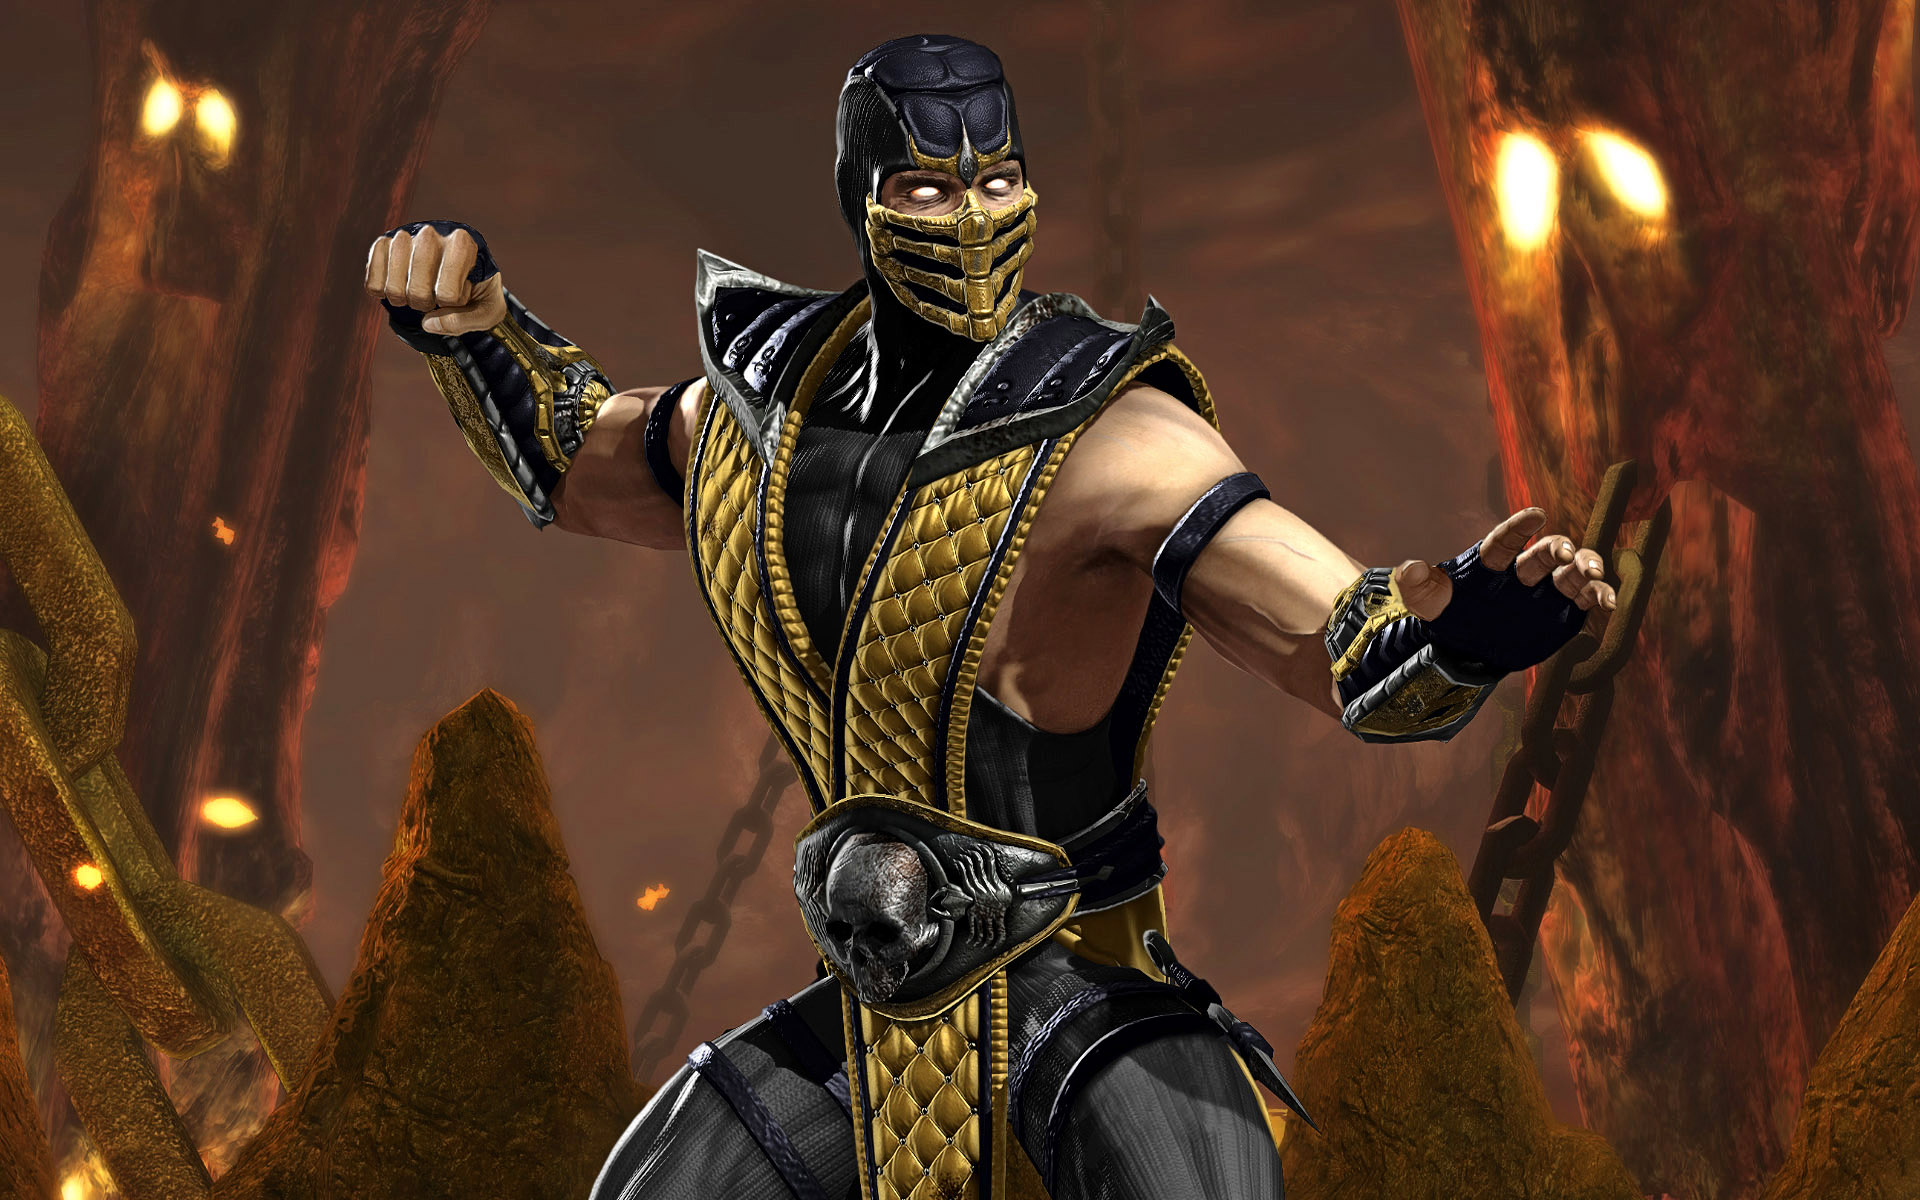 Scorpion Wallpaper Mortal Kombat   FotoLatinasCom 1920x1200